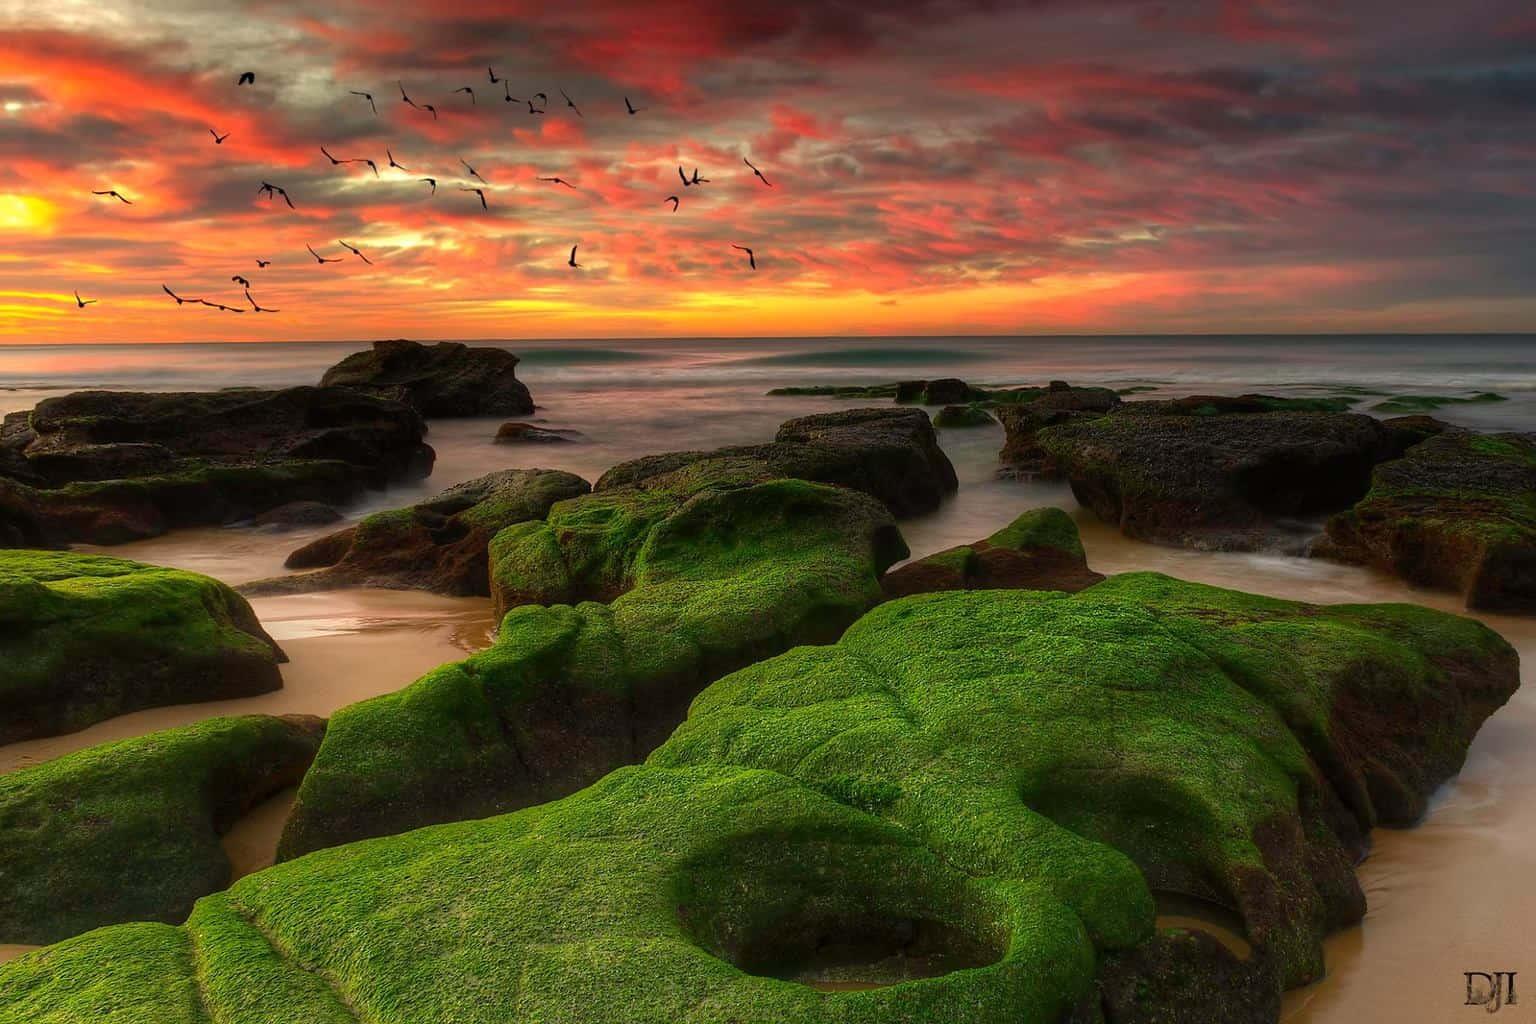 Sunrise from Merewether Beach Newcastle Australia.